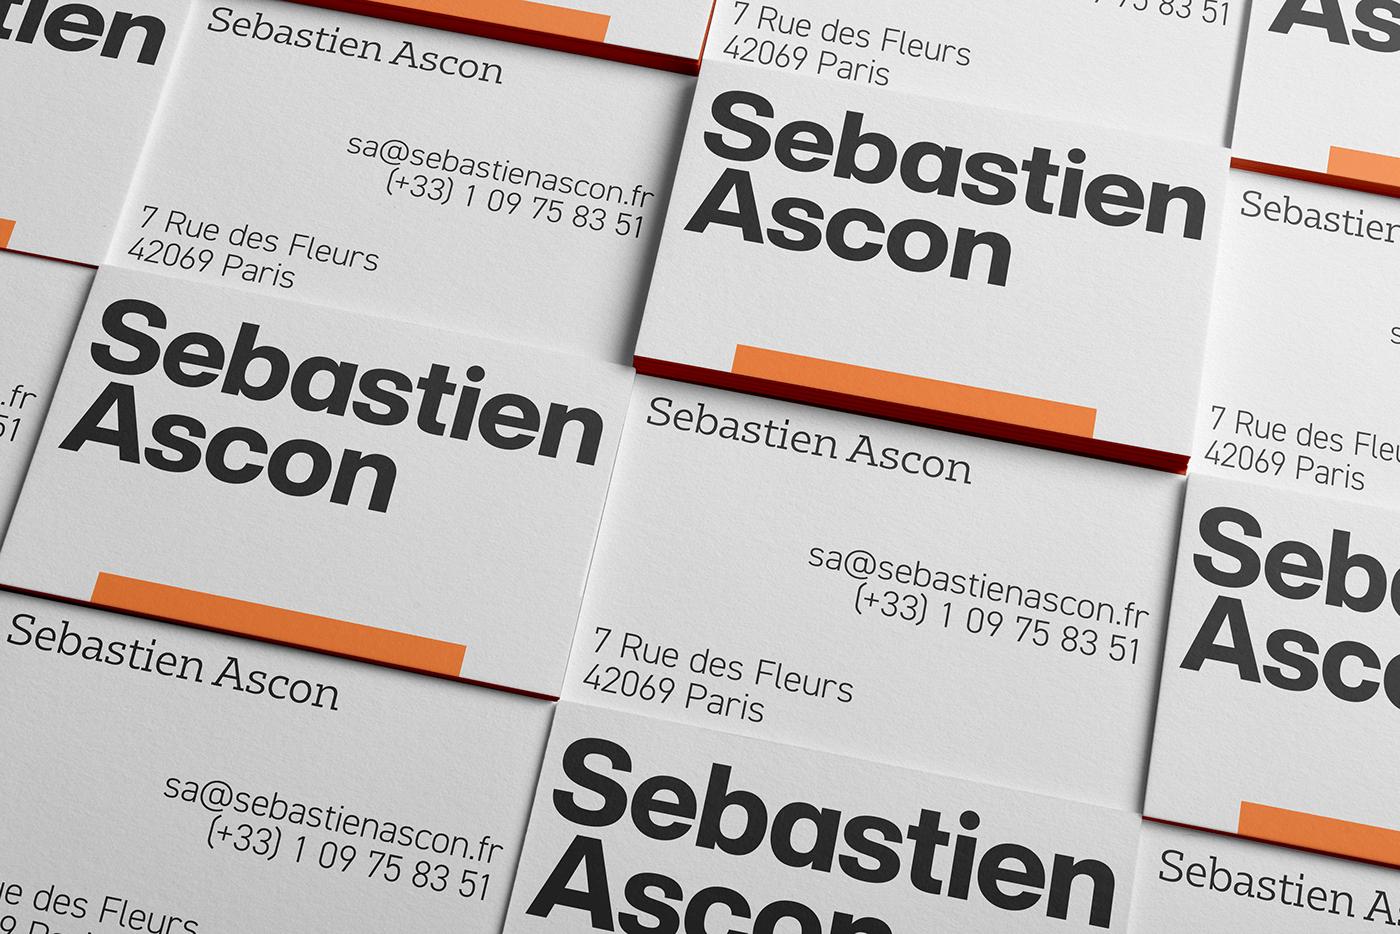 sebastien ascon business cards